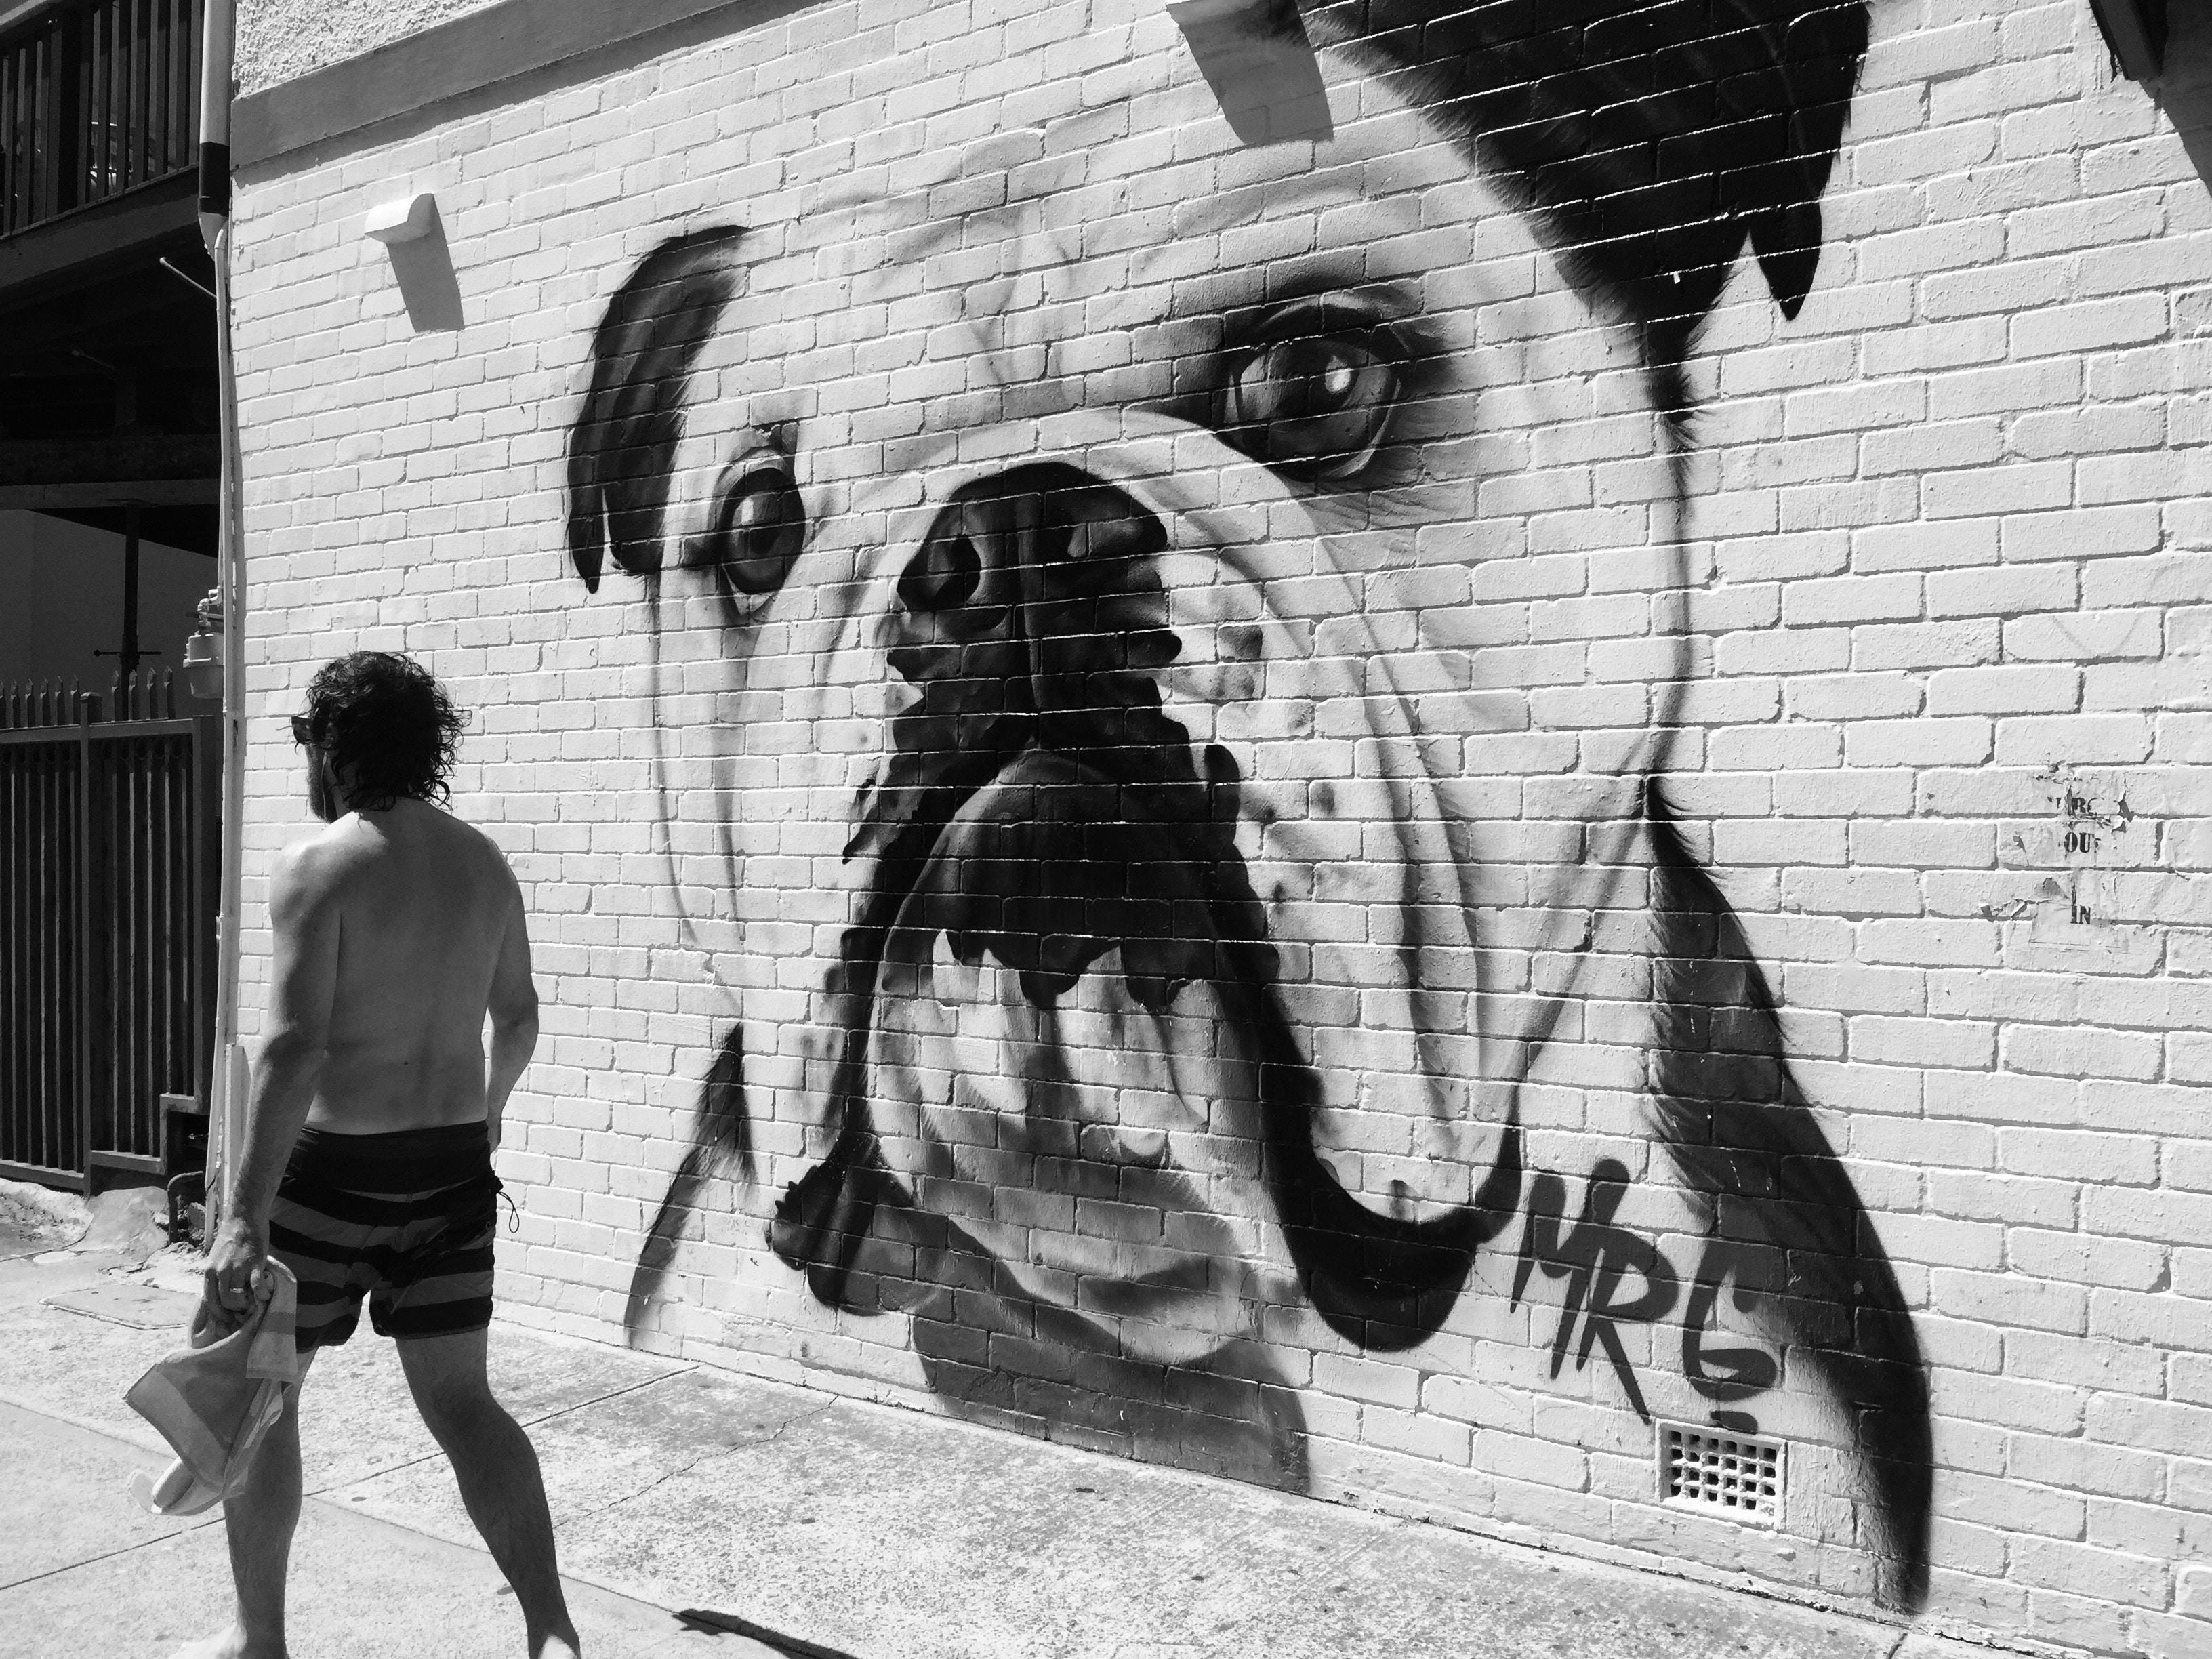 A white bulldog painted on a brick wall.